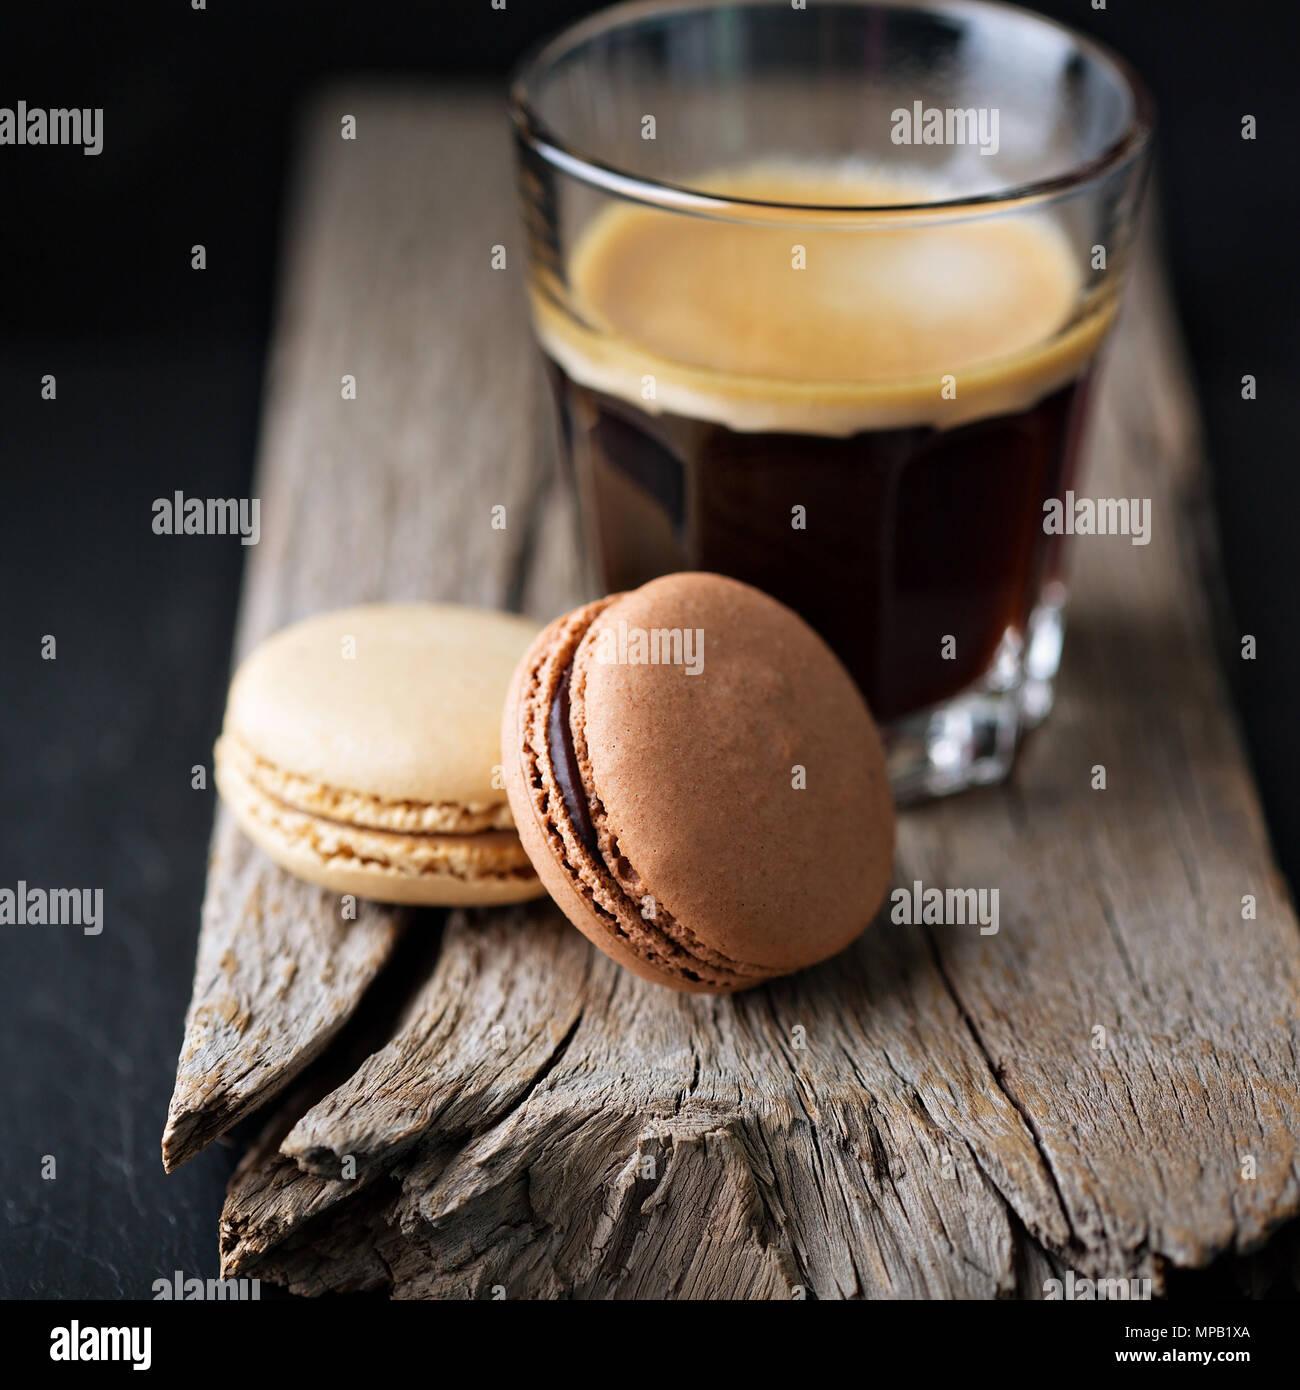 Schokolade und Kaffee macarons Stockbild